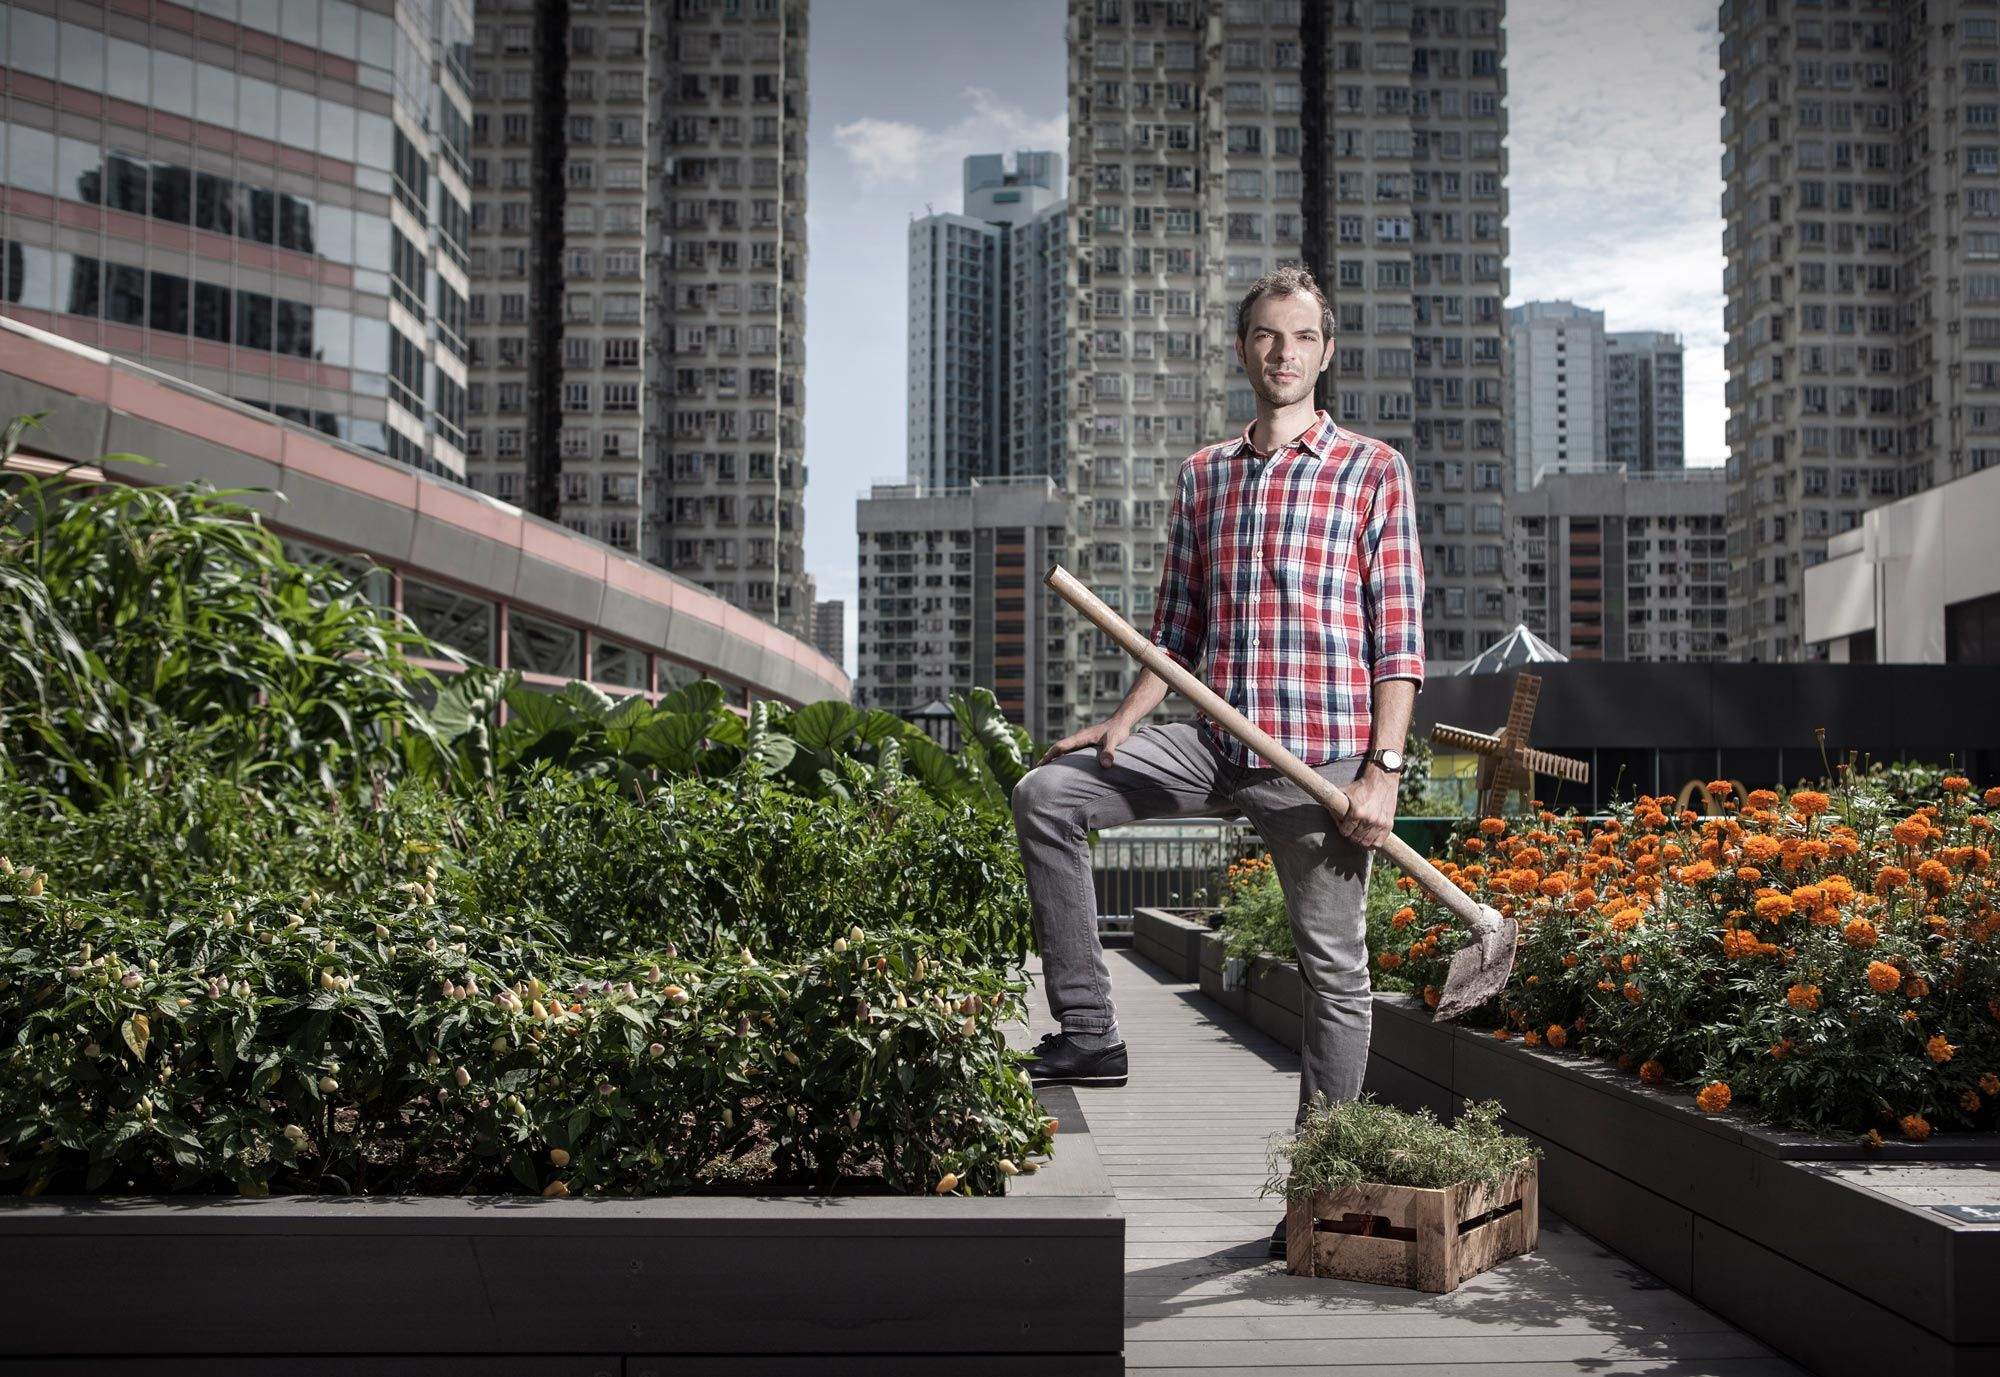 Pol Fàbrega On Why Urban Farming Is The Next Step In Conscious Eating